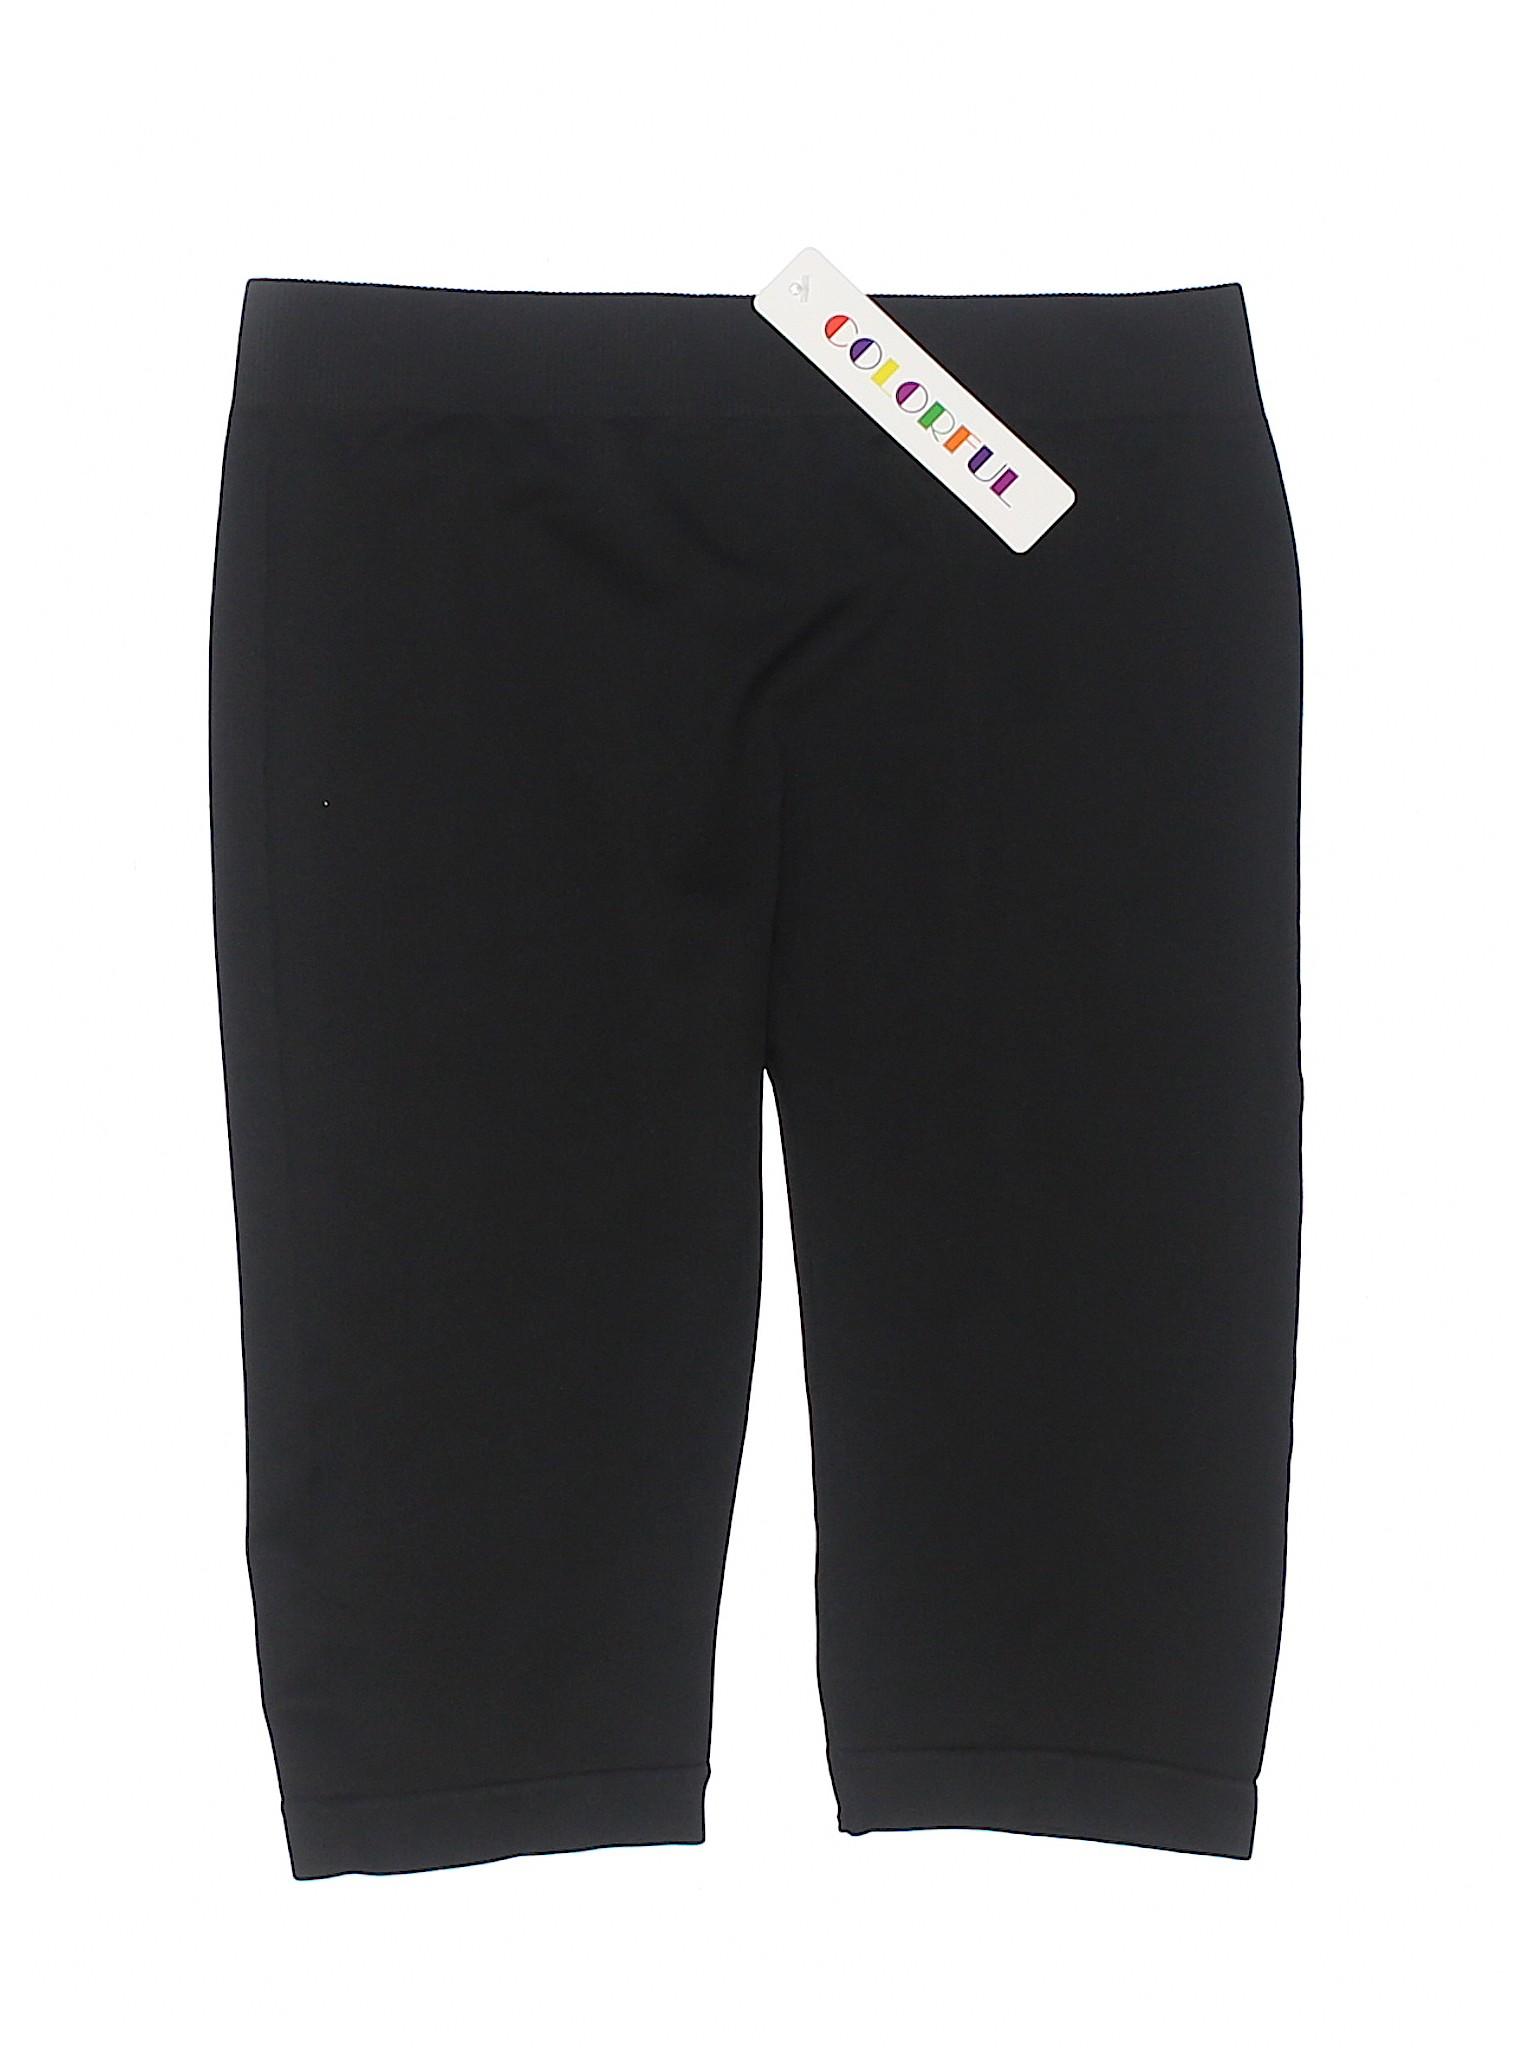 Boutique Shorts Boutique winter winter Colorful 5qy6Ya